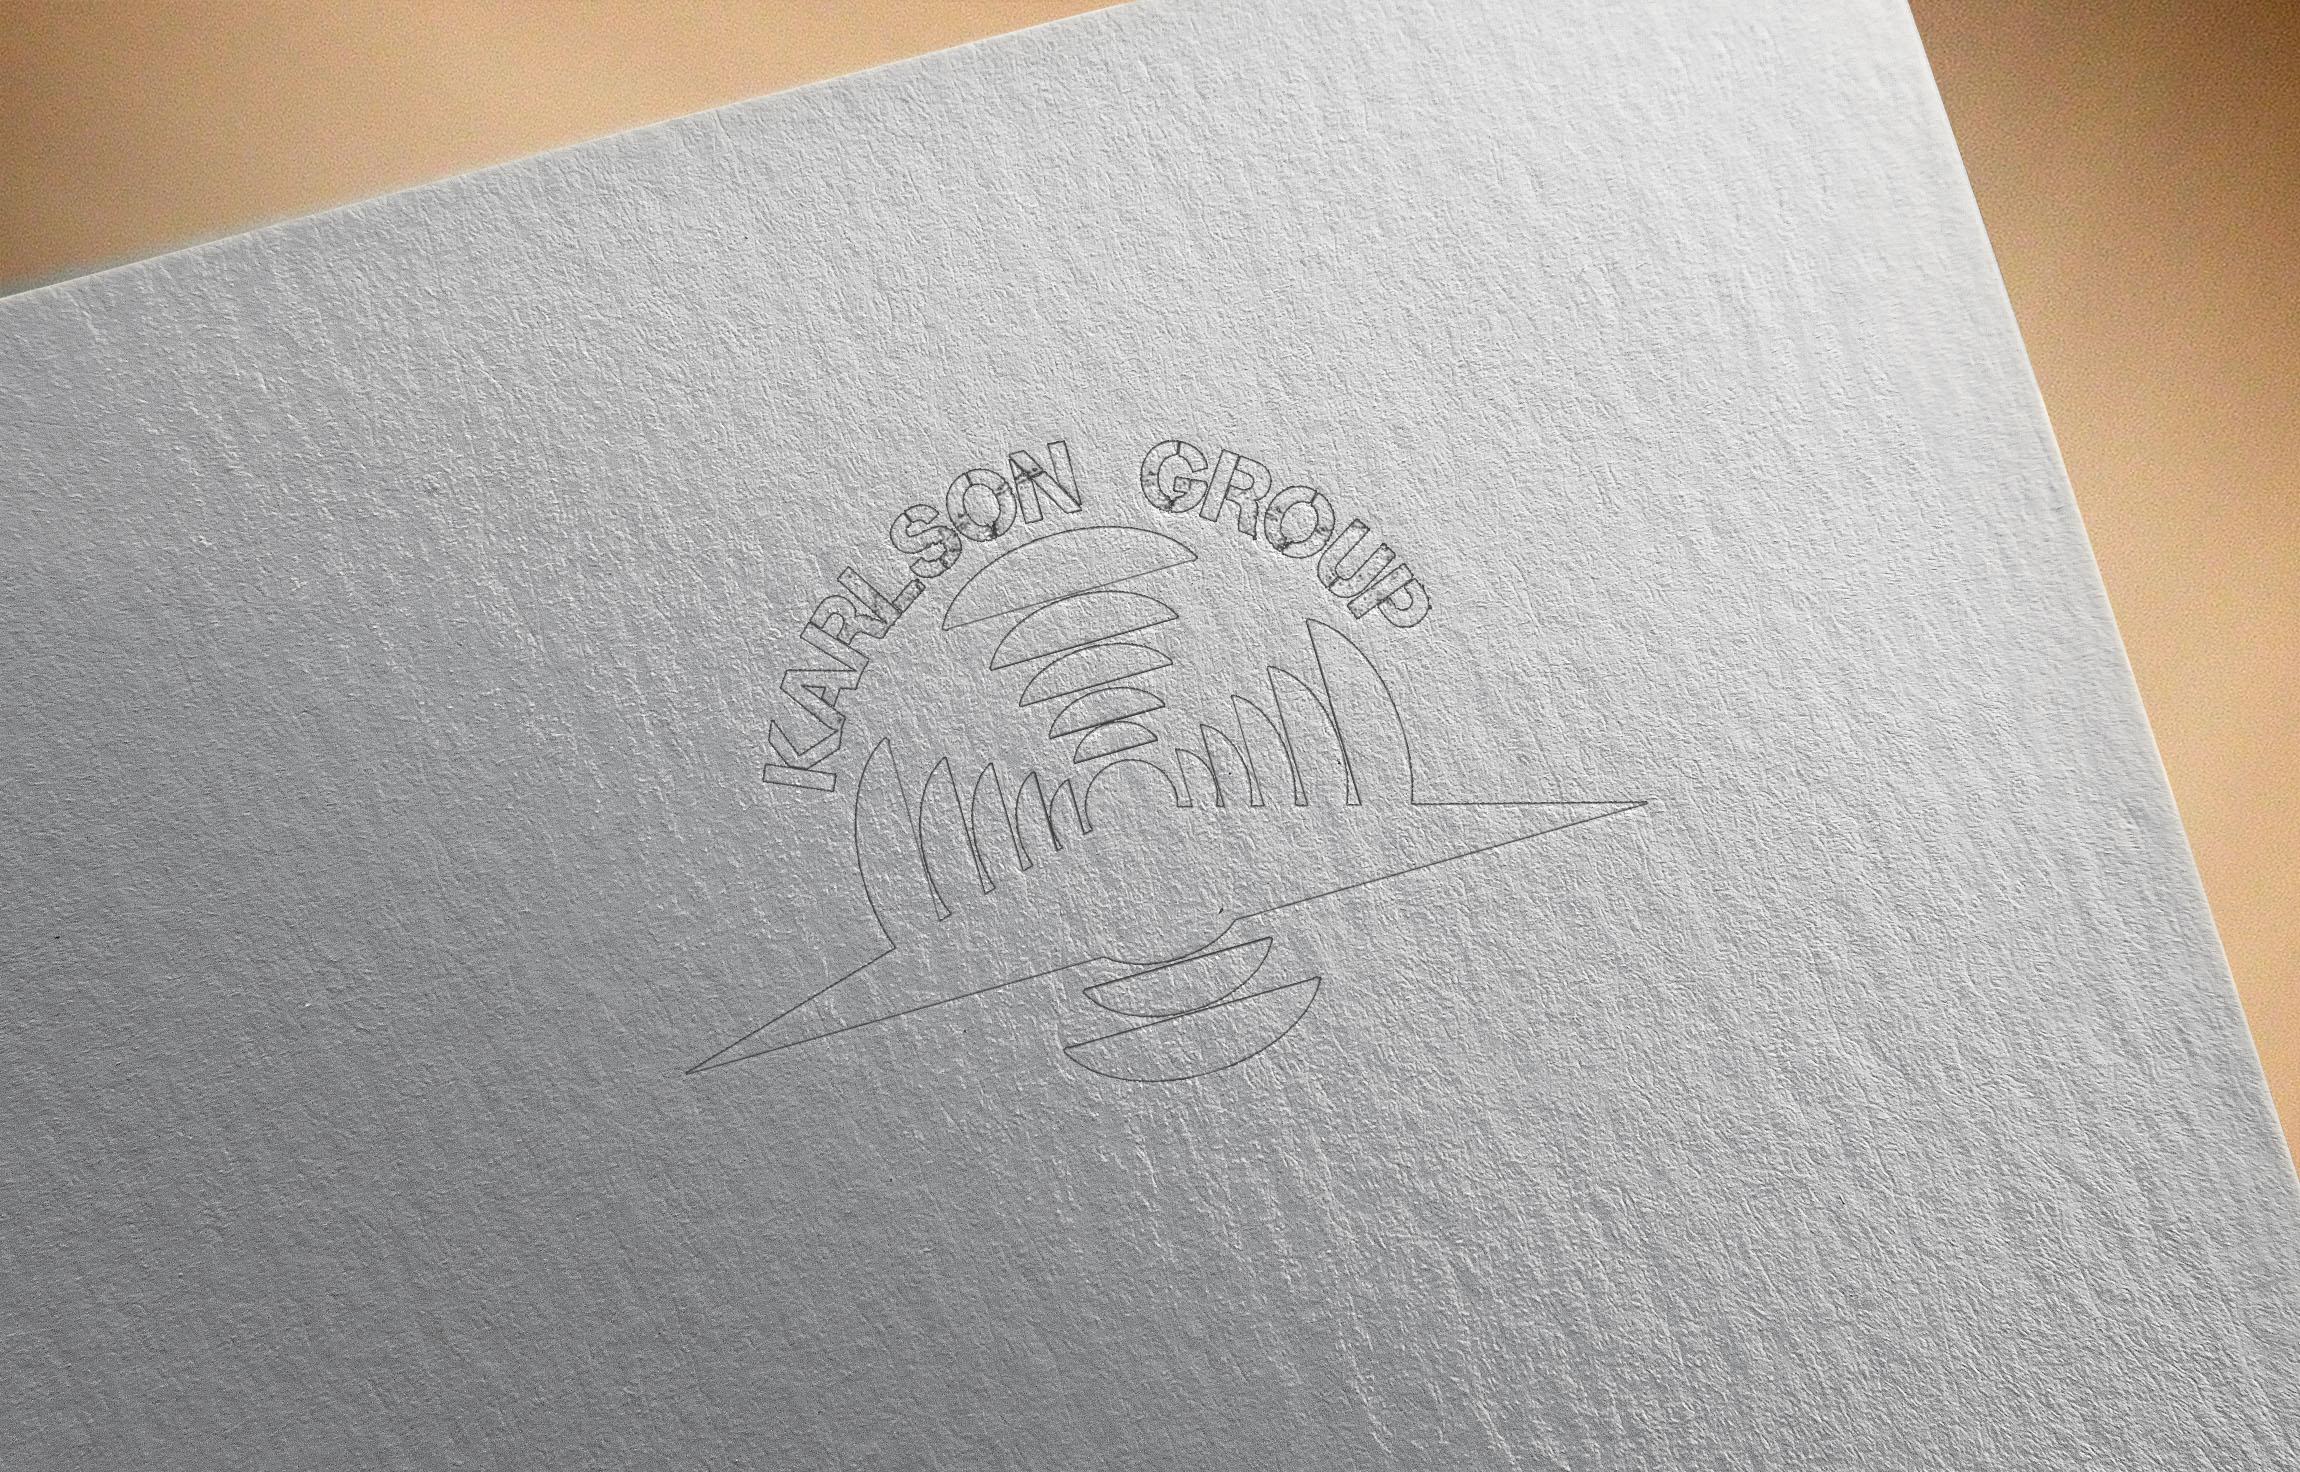 Придумать классный логотип фото f_0635988fa5fa9521.jpg